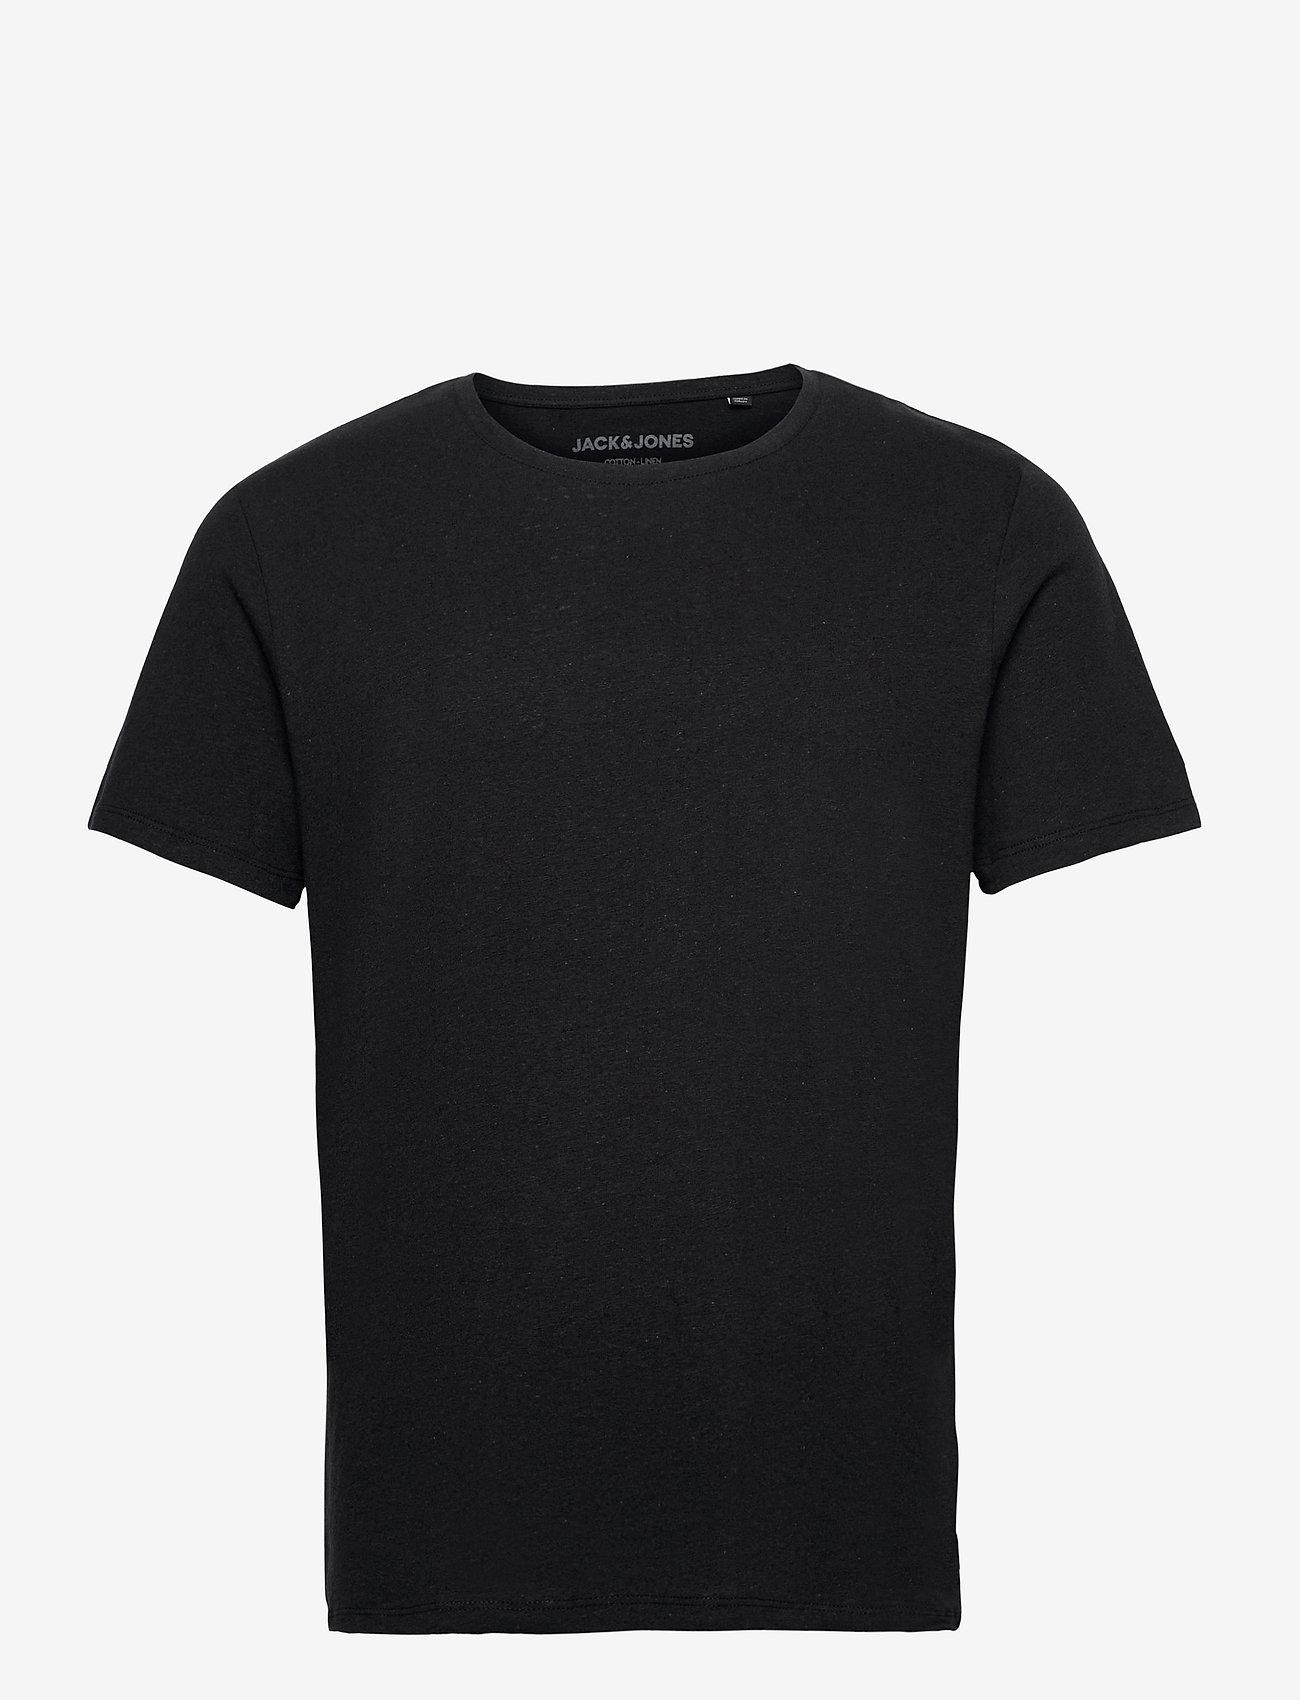 Jack & Jones - JJELINEN BASIC TEE SS CREW NECK STS - basic t-shirts - black - 0